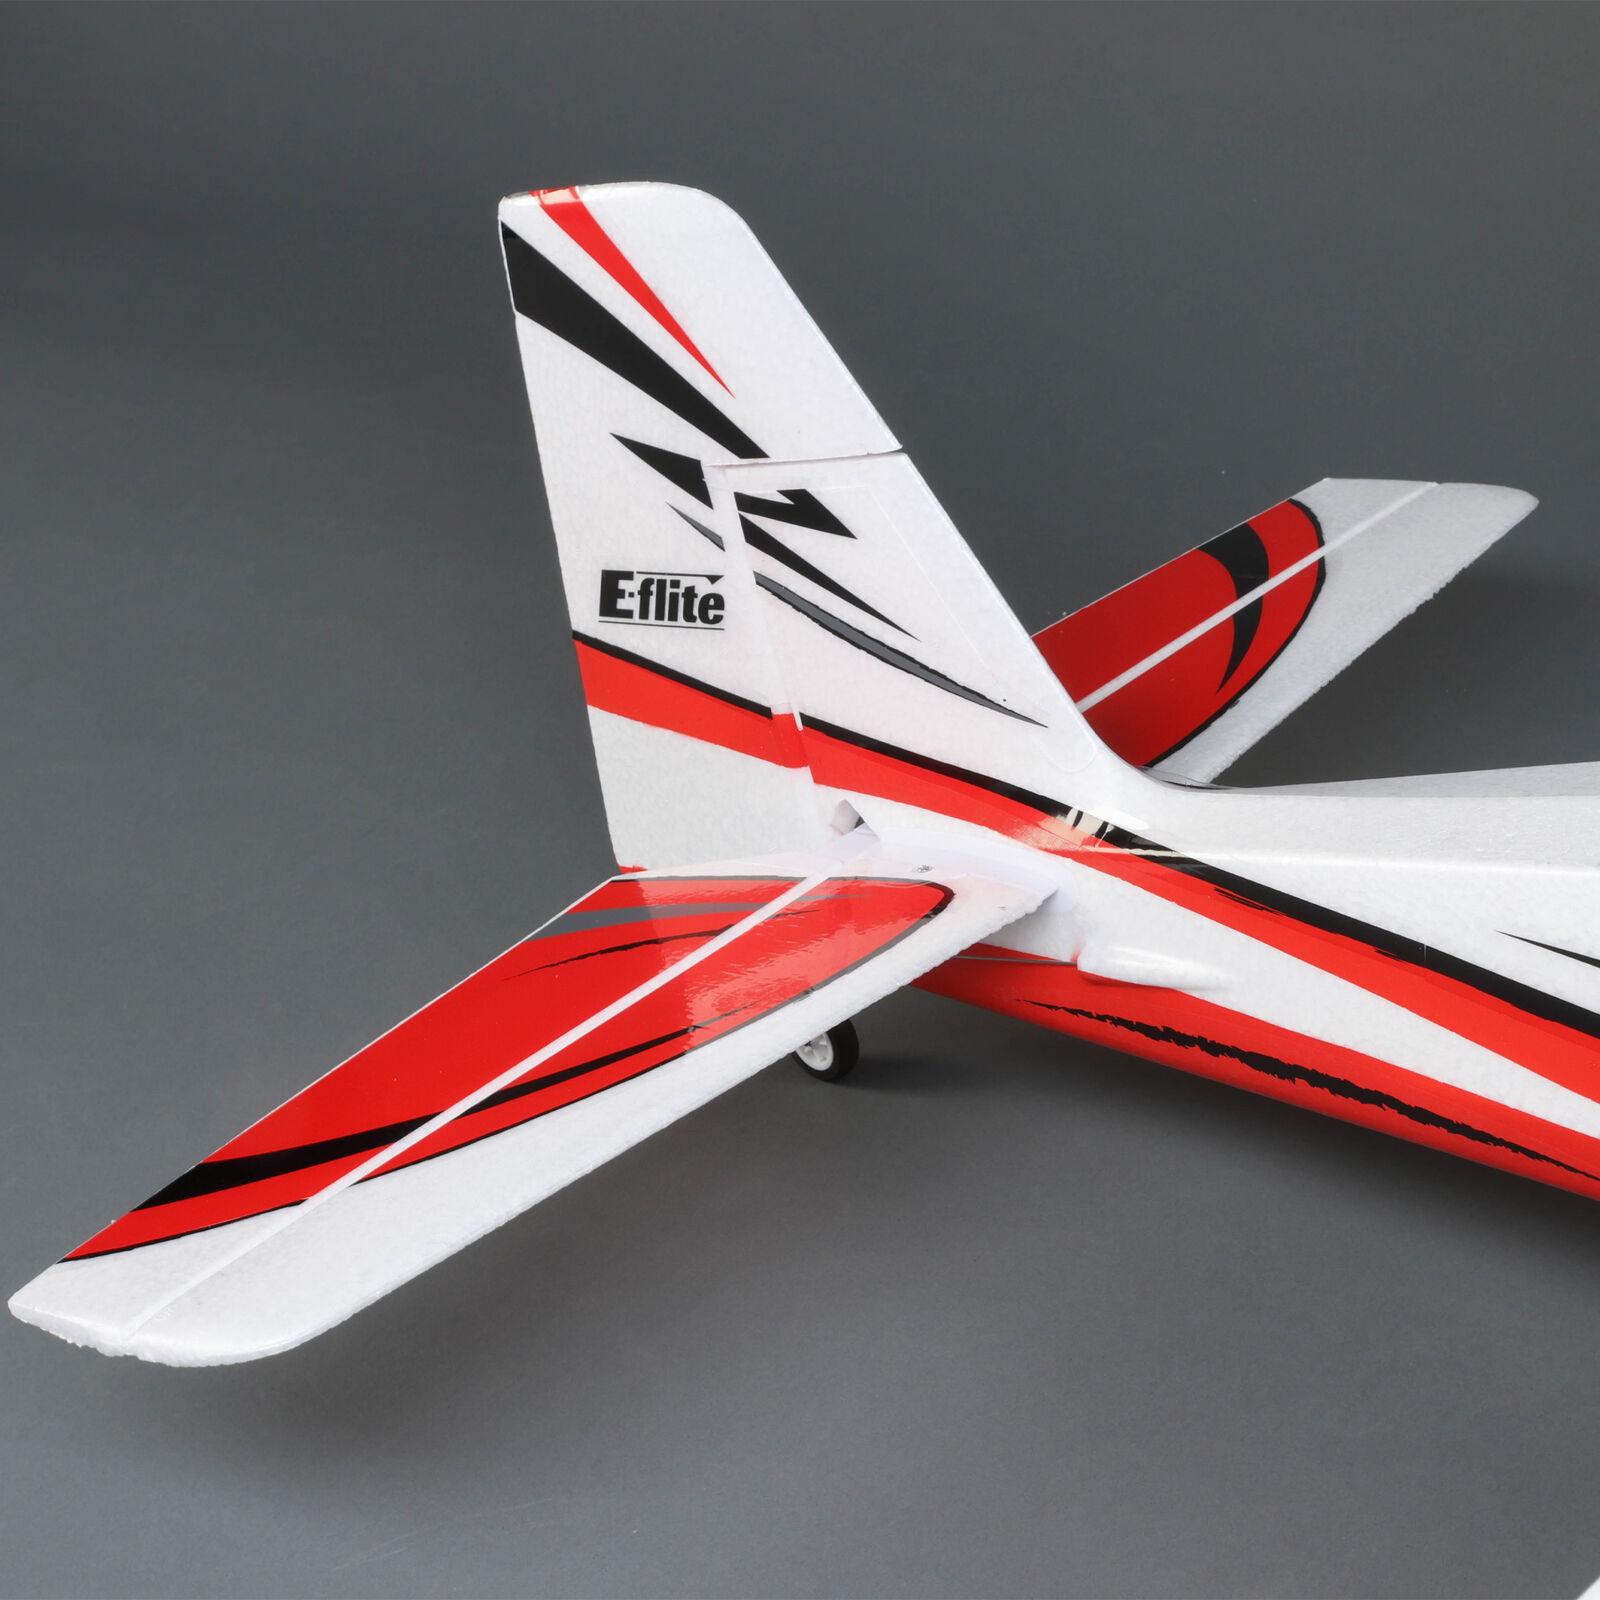 Turbo Timber Evolution E-flite